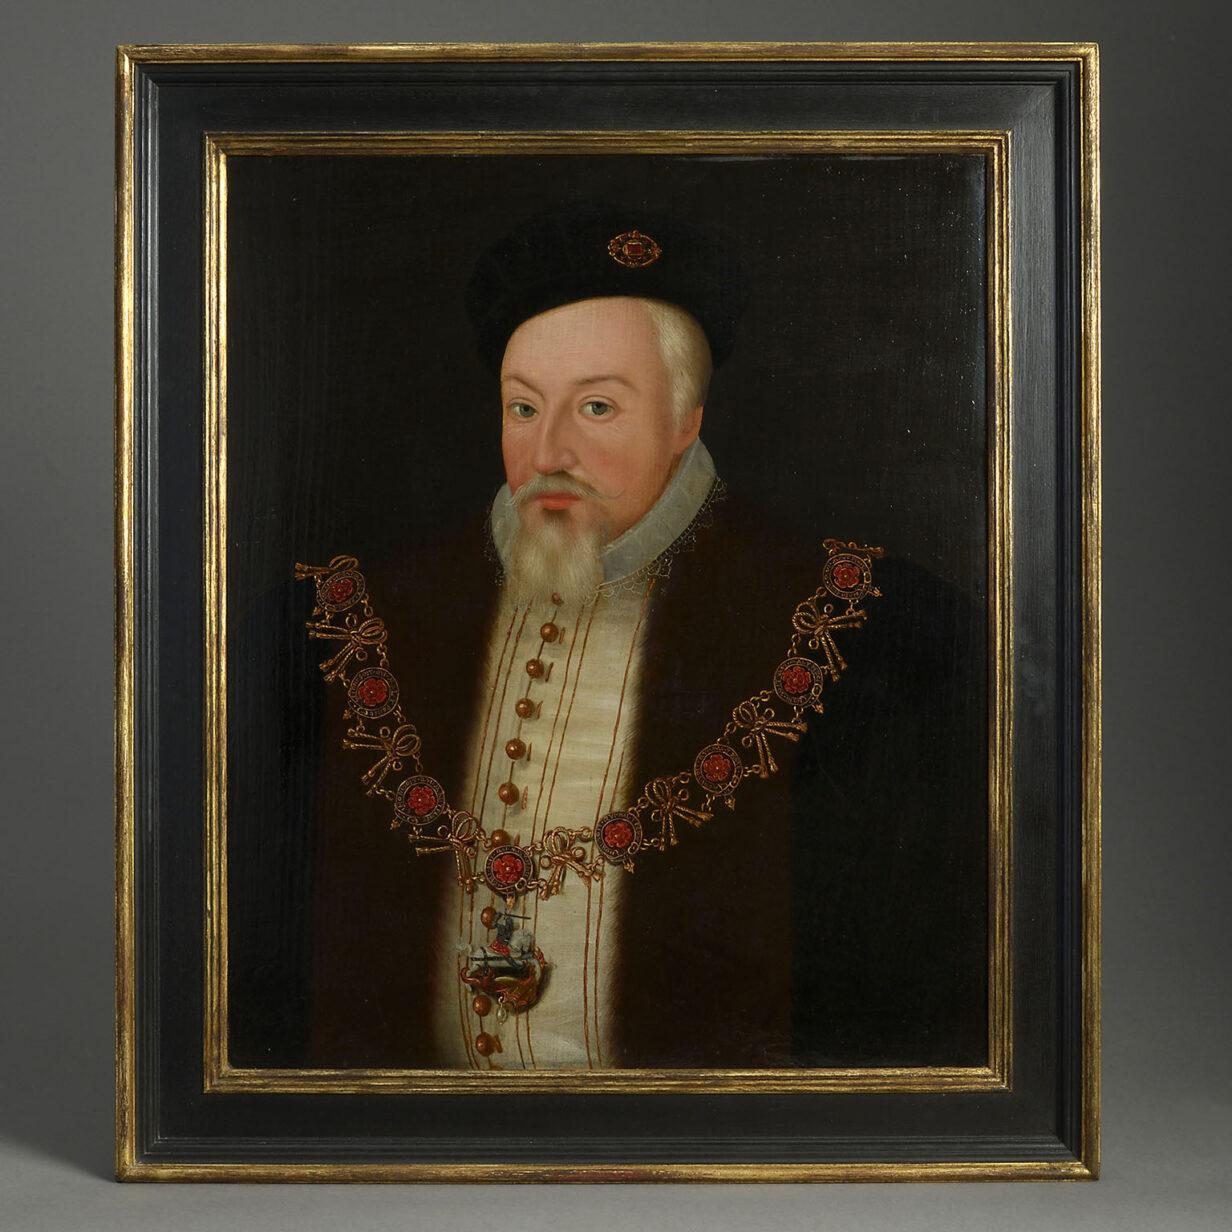 Robert Dudley Earl of Leicester Portrait